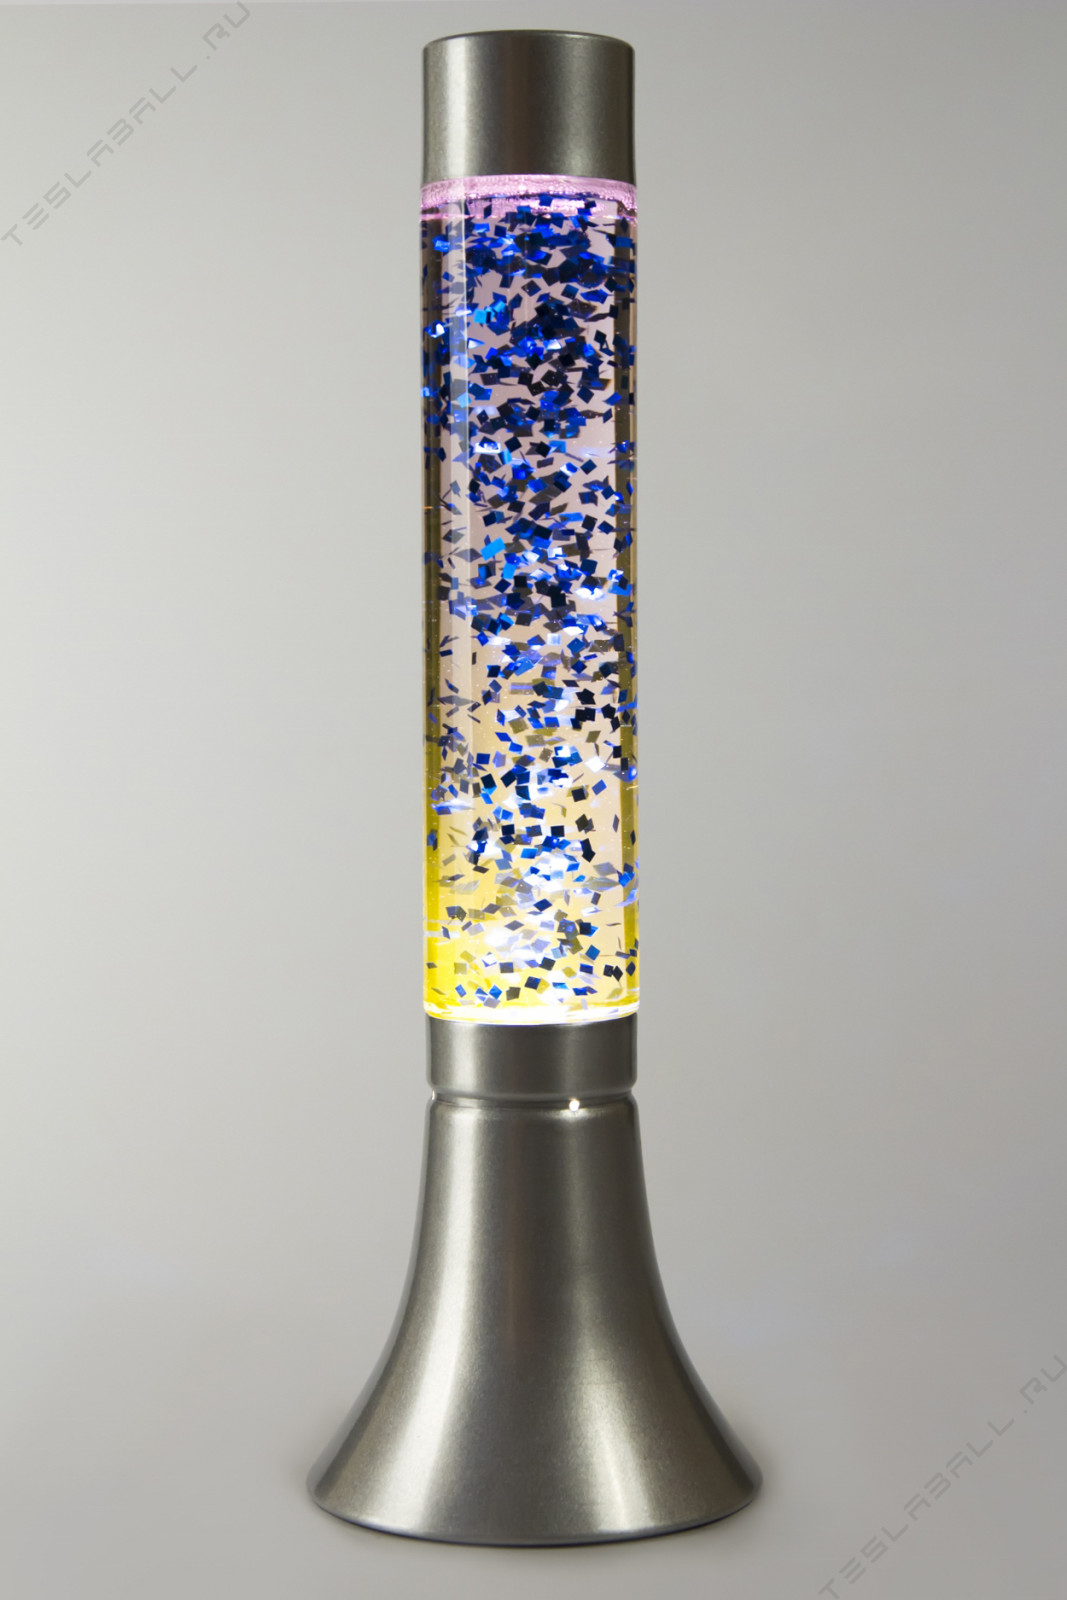 Лава лампа с блёстками